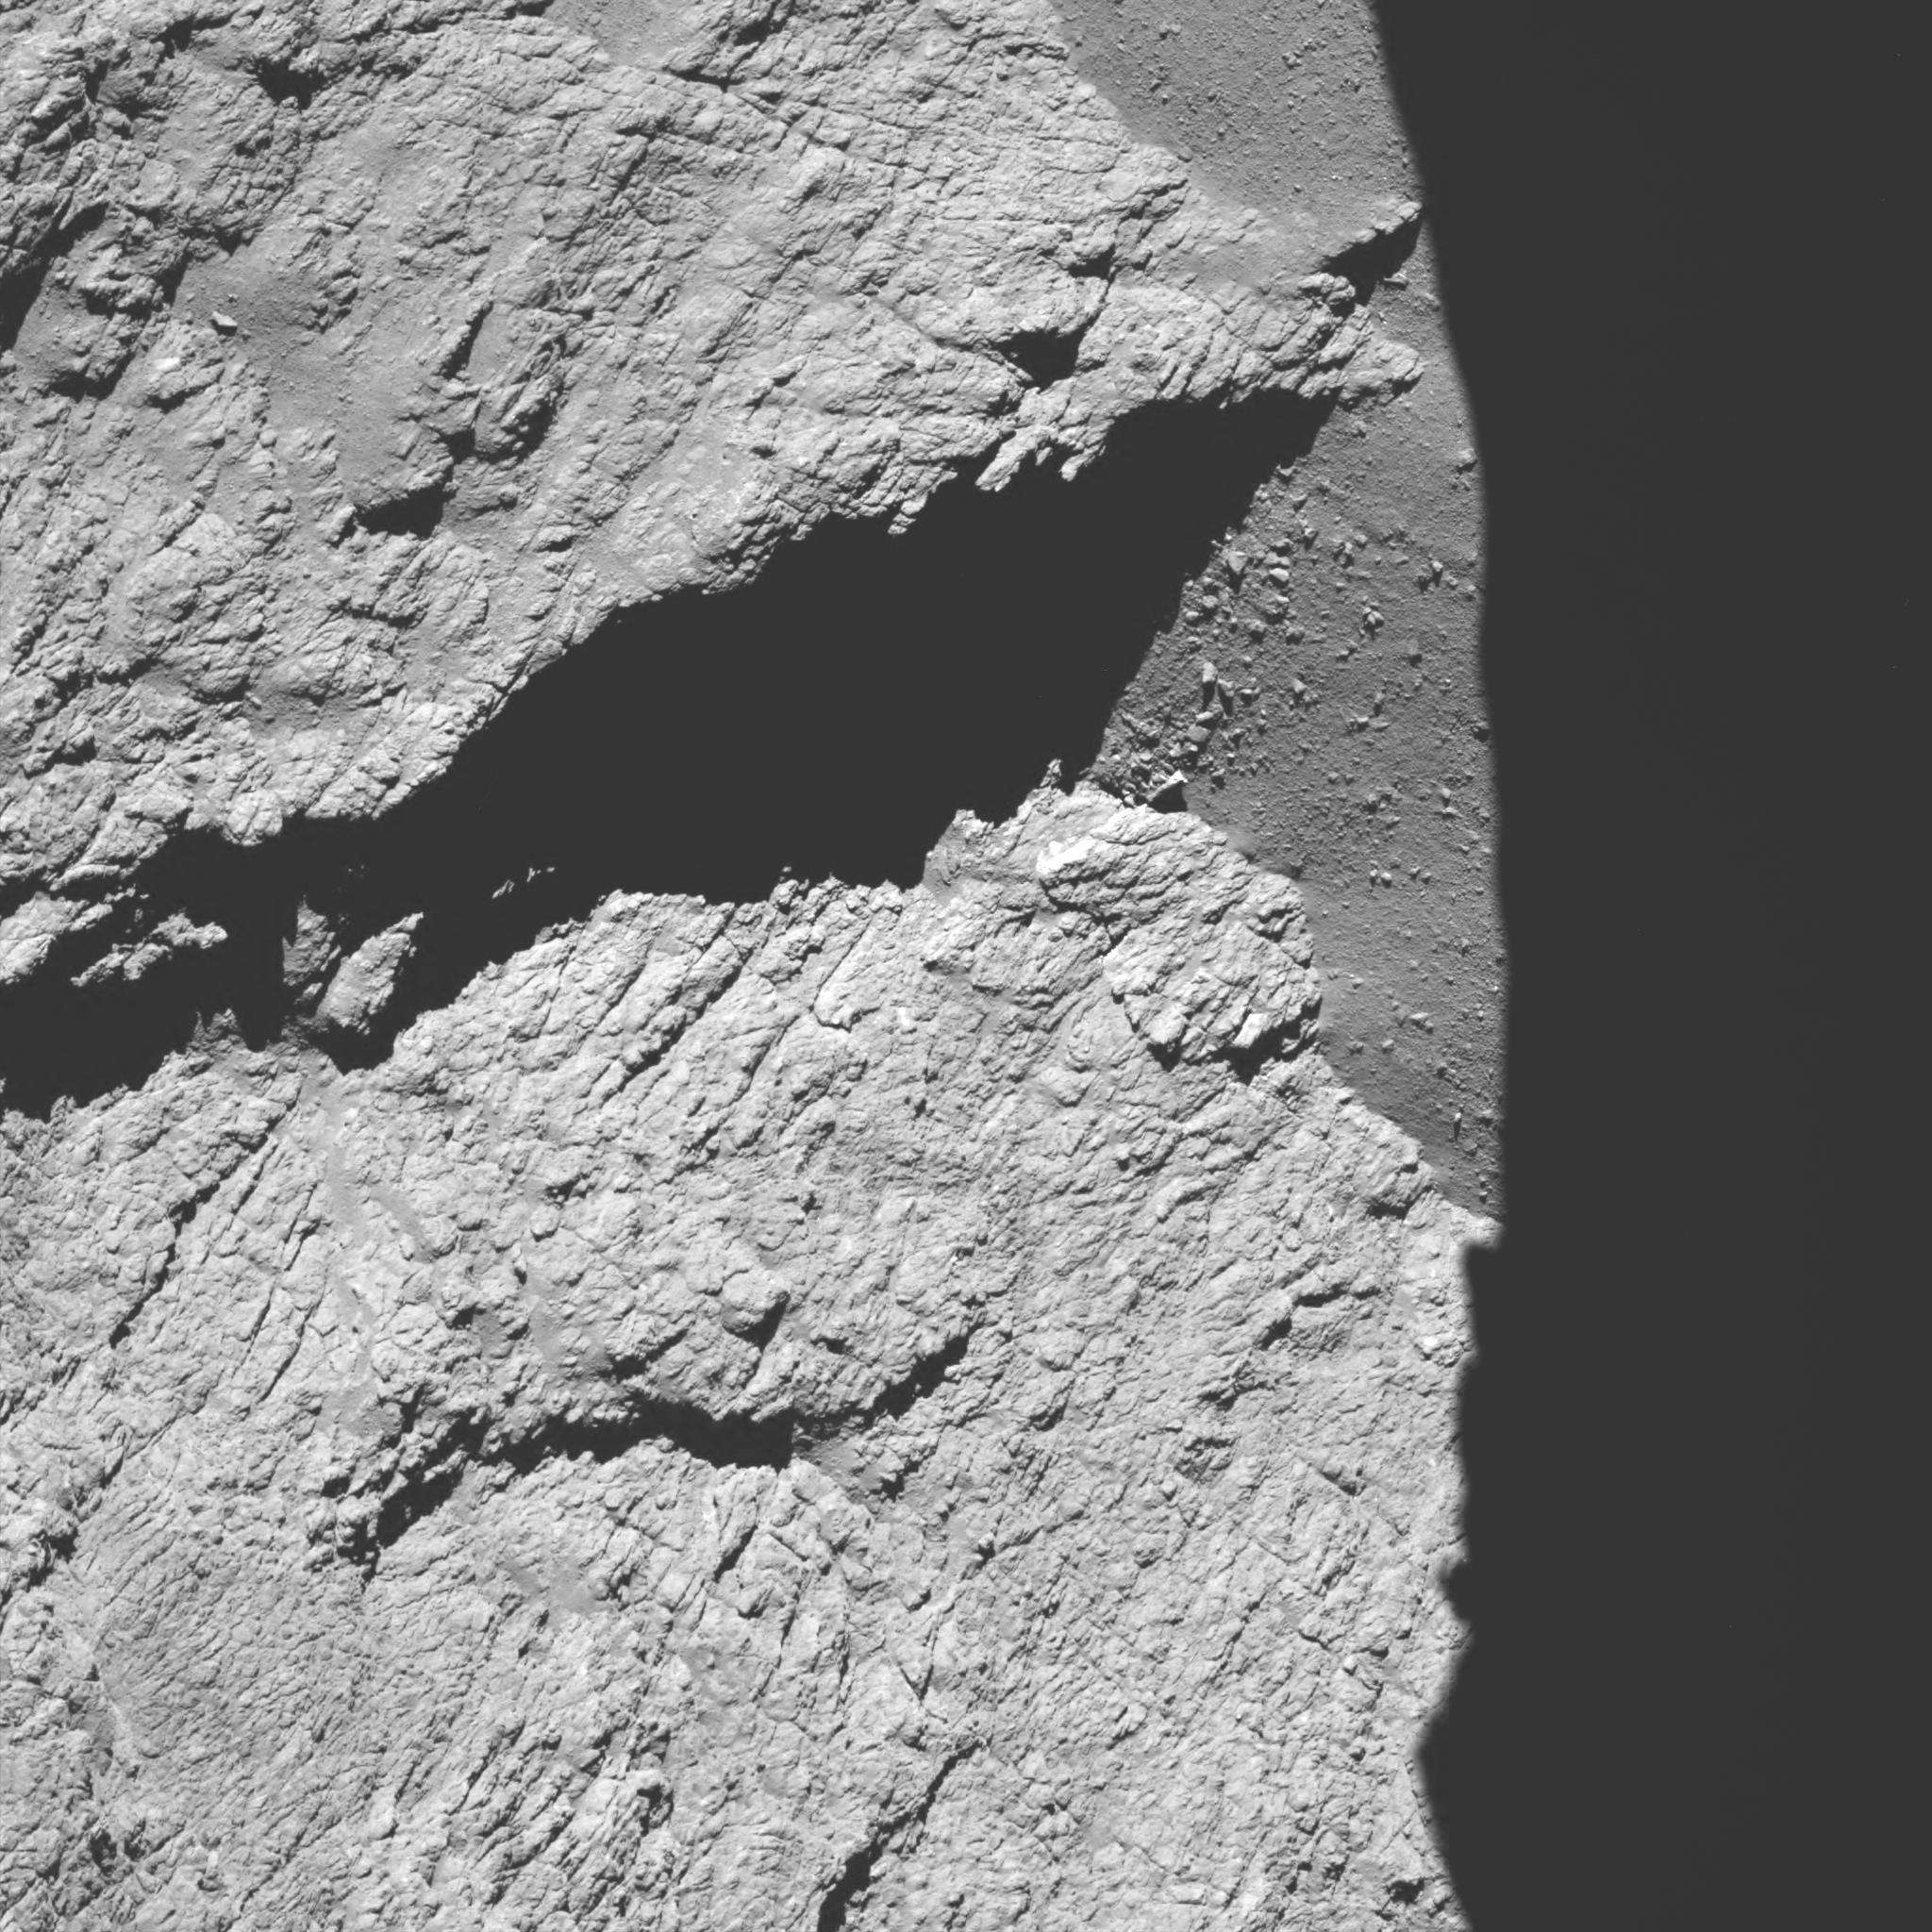 comet_from_11-7_km_narrow-angle_camera